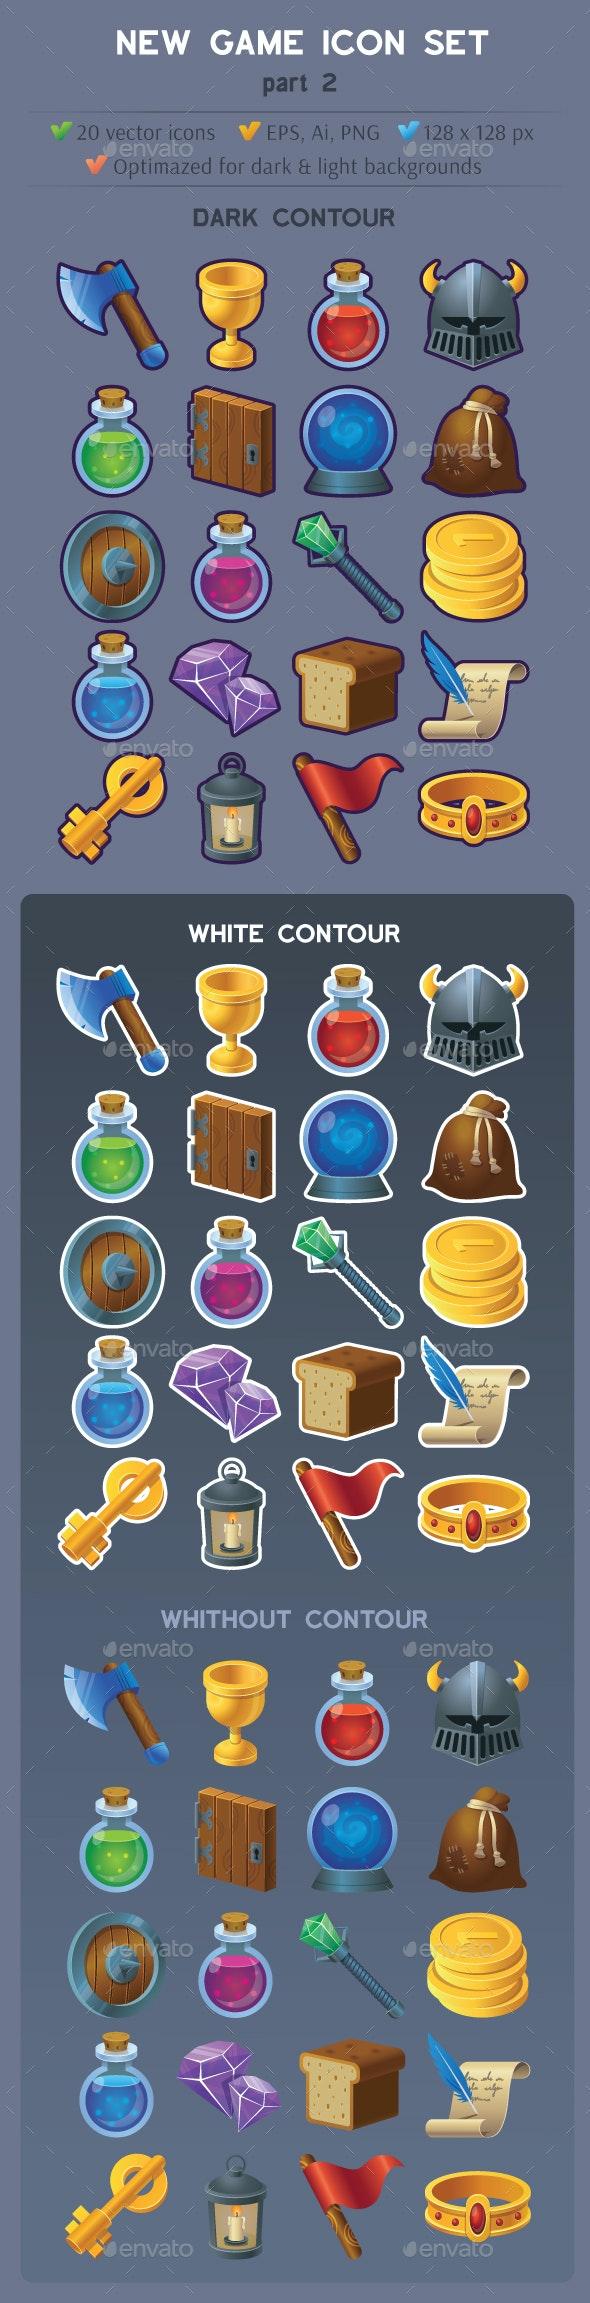 New Game Icon Set part 2